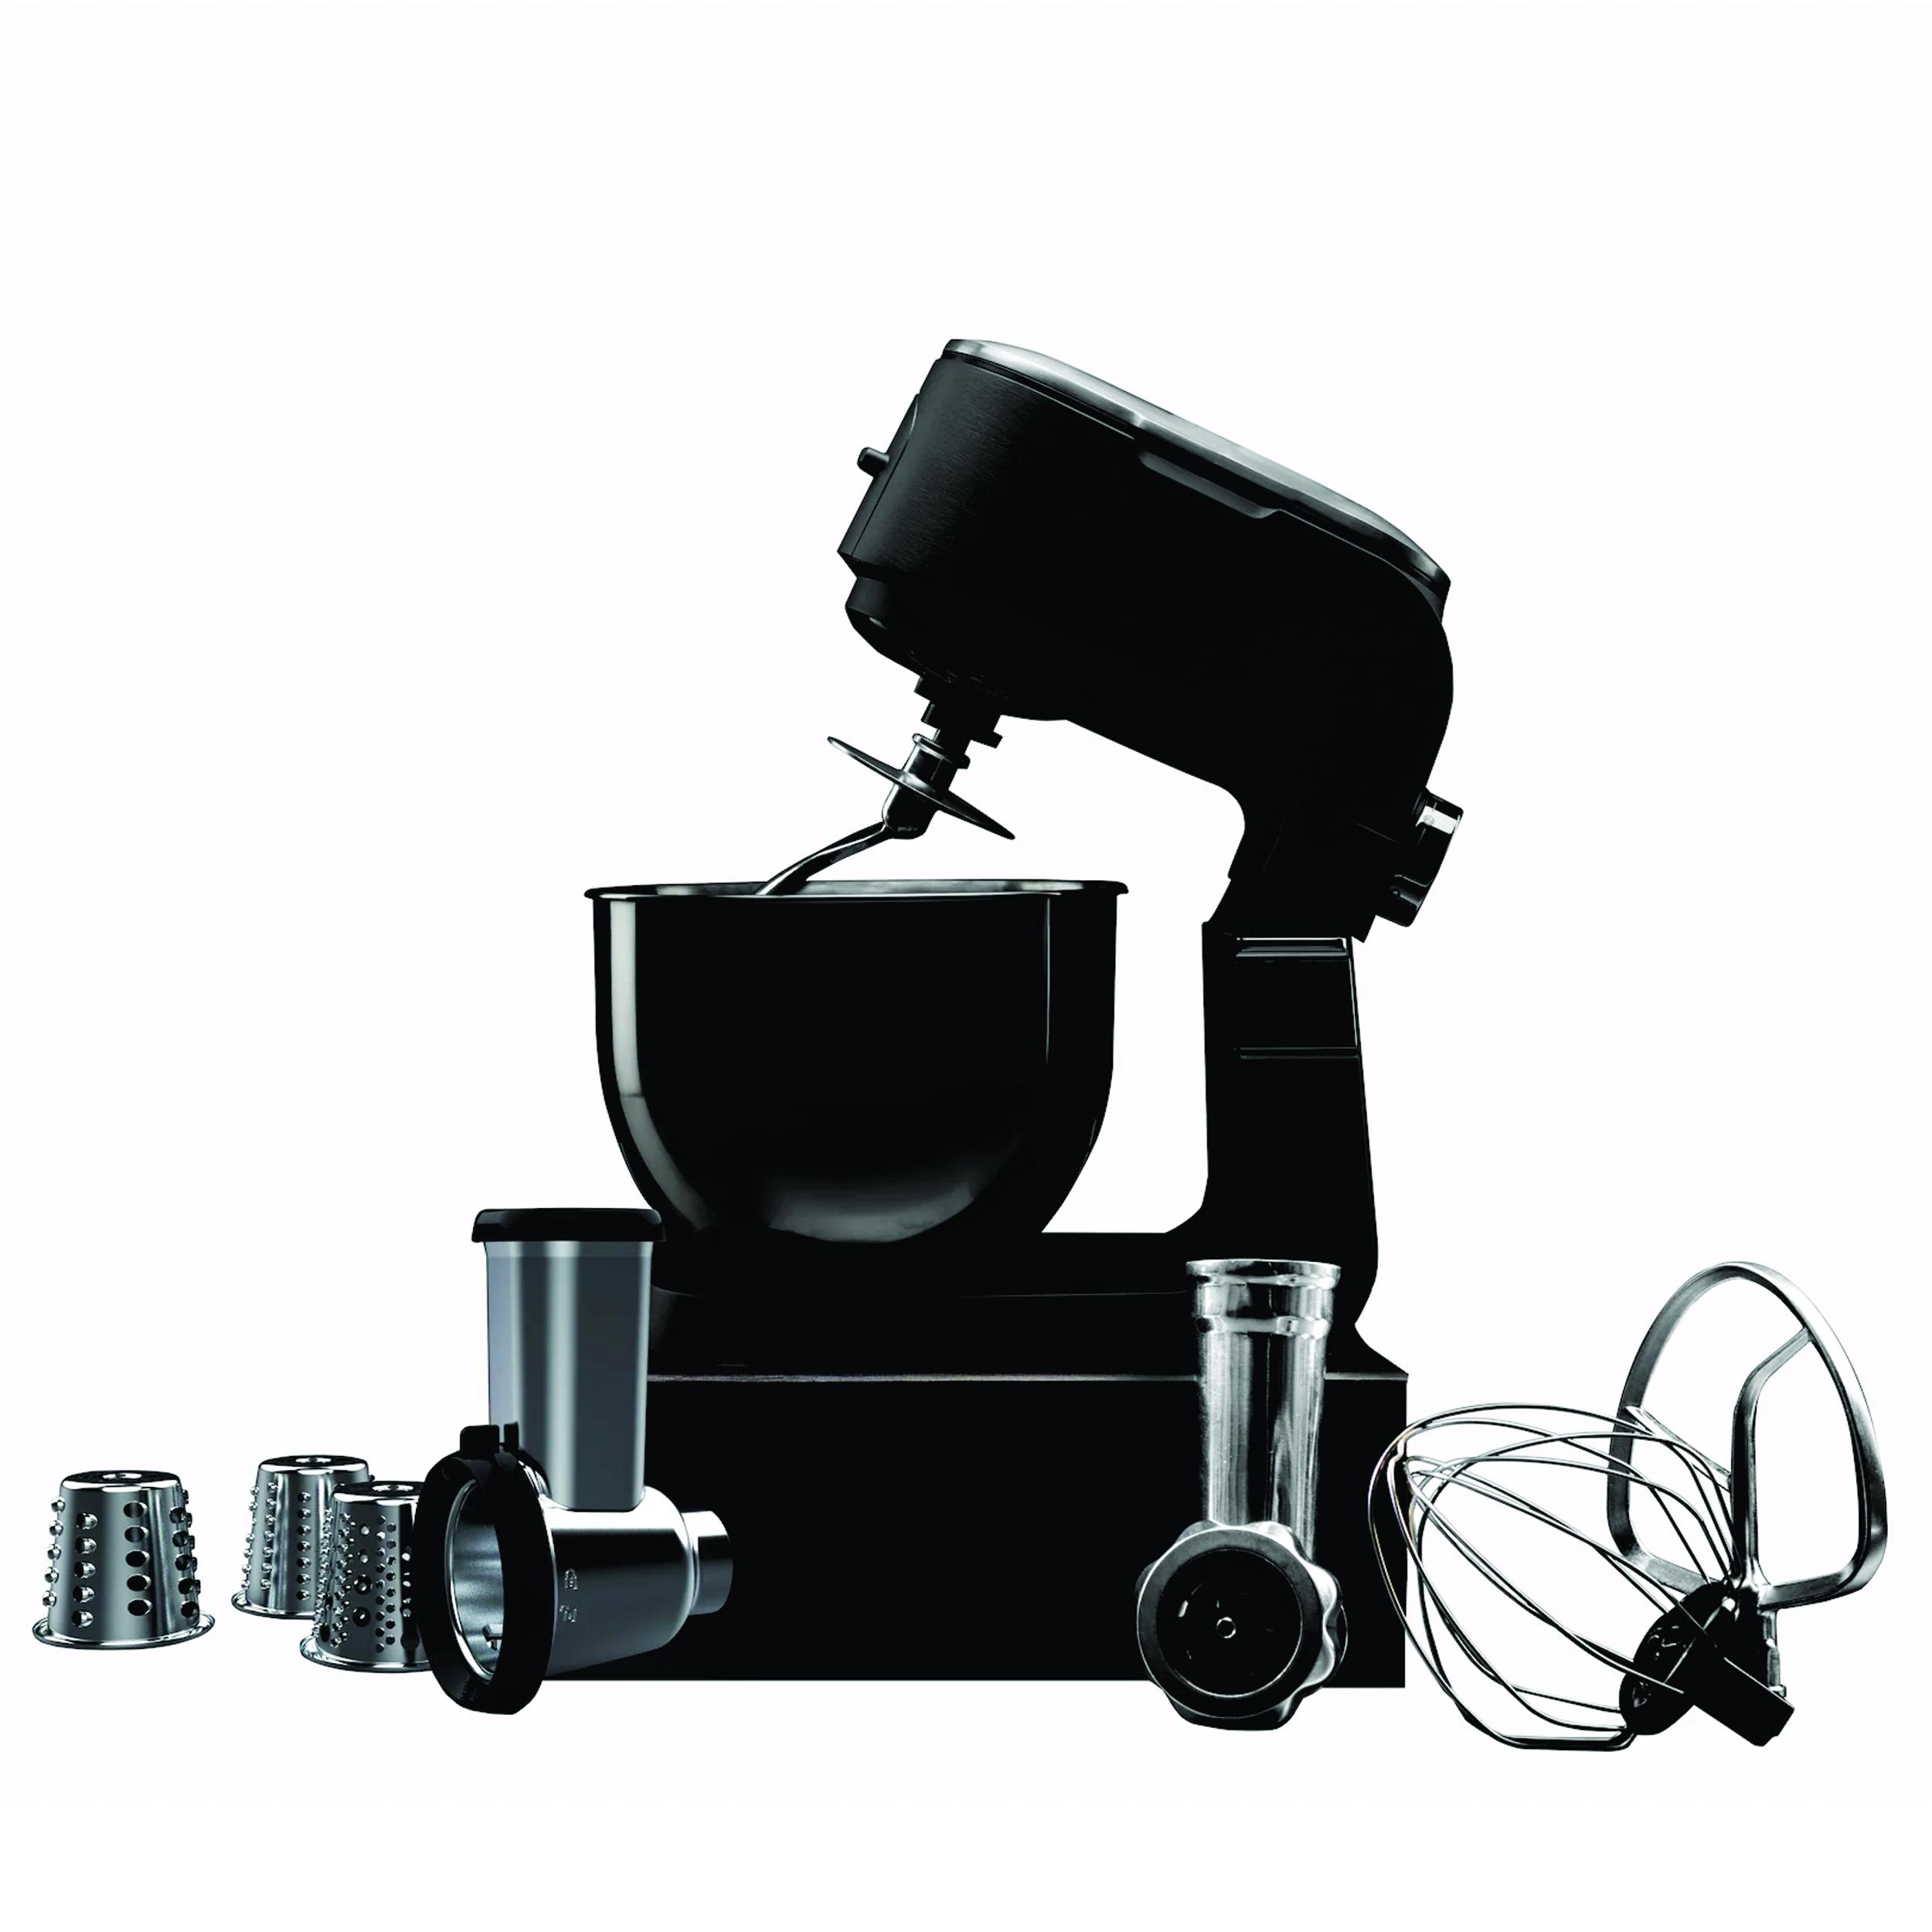 Hafele Stand Mixer 6.5L VIOLA PRO